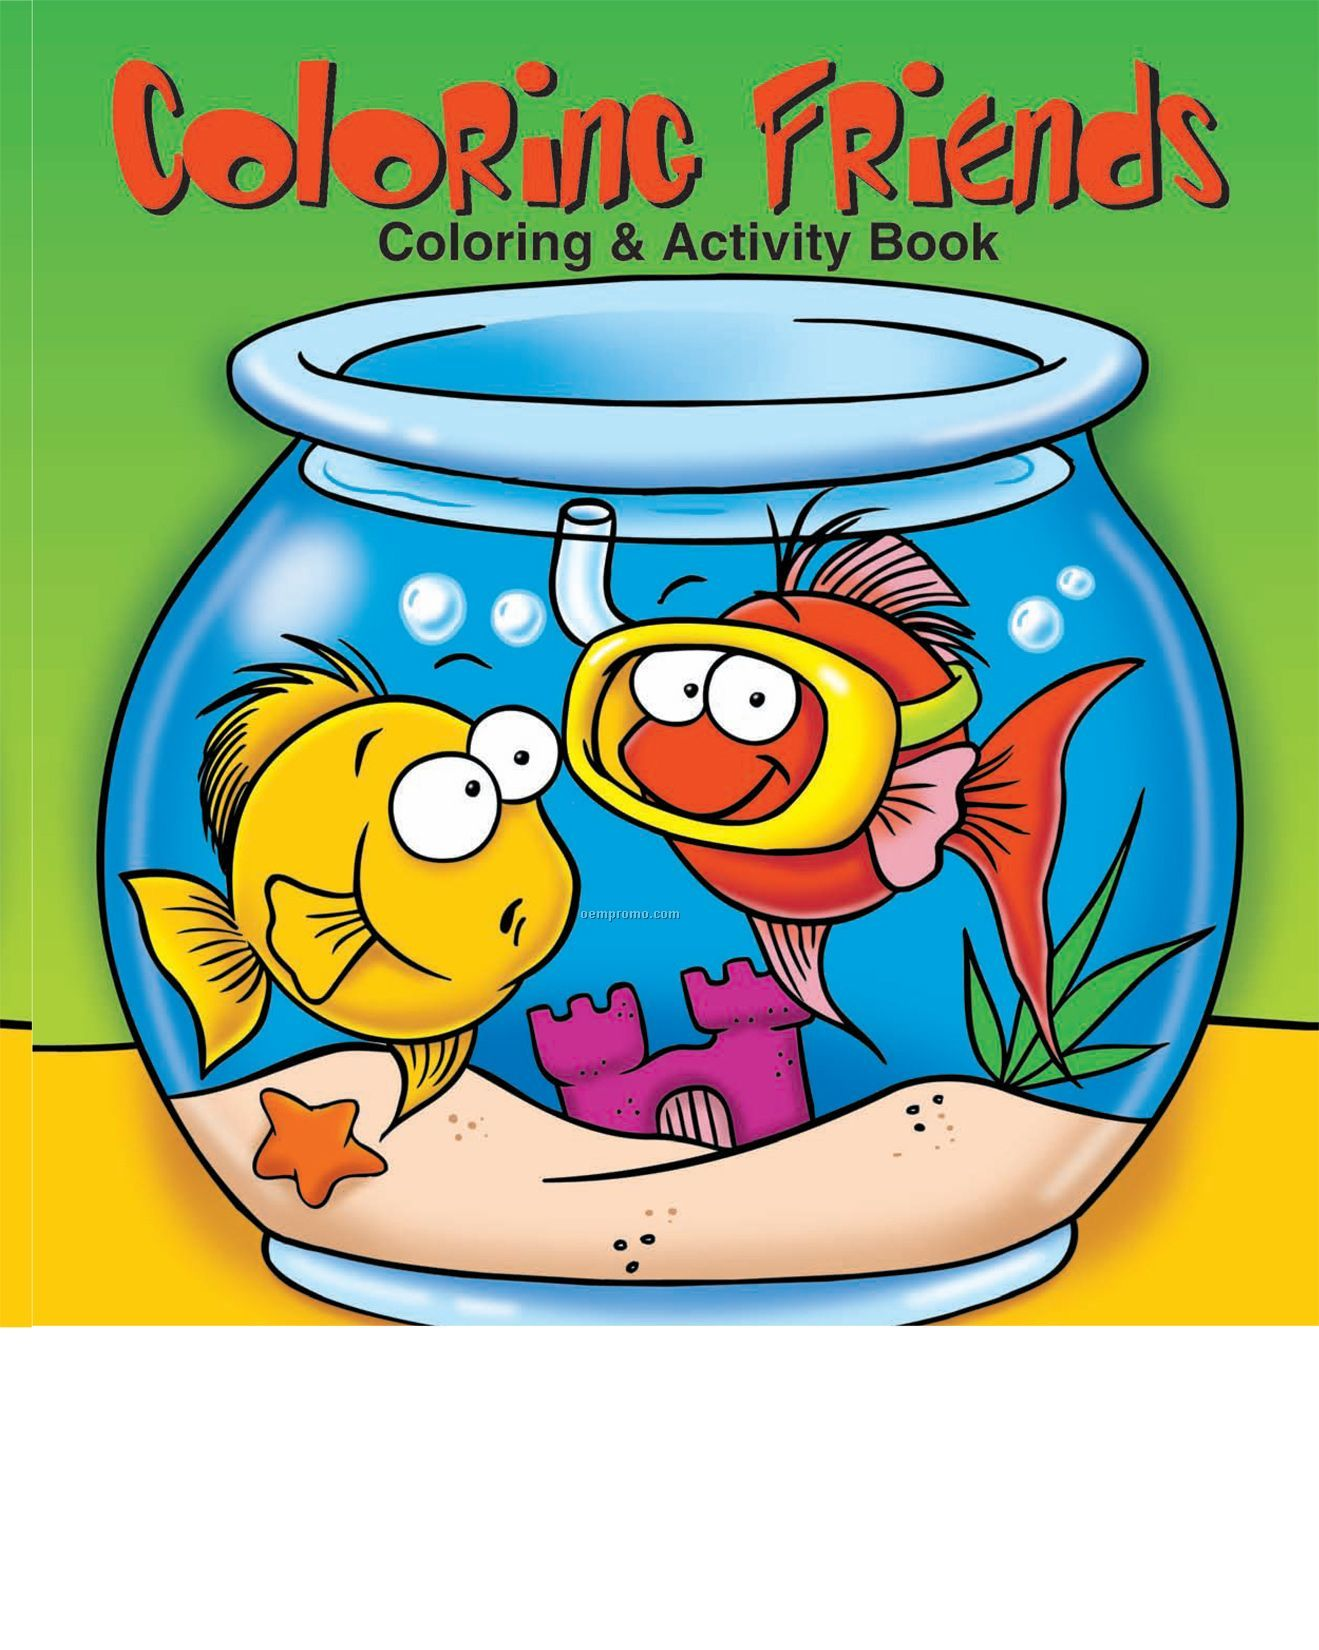 Coloring Friends Coloring Book Fun Pack